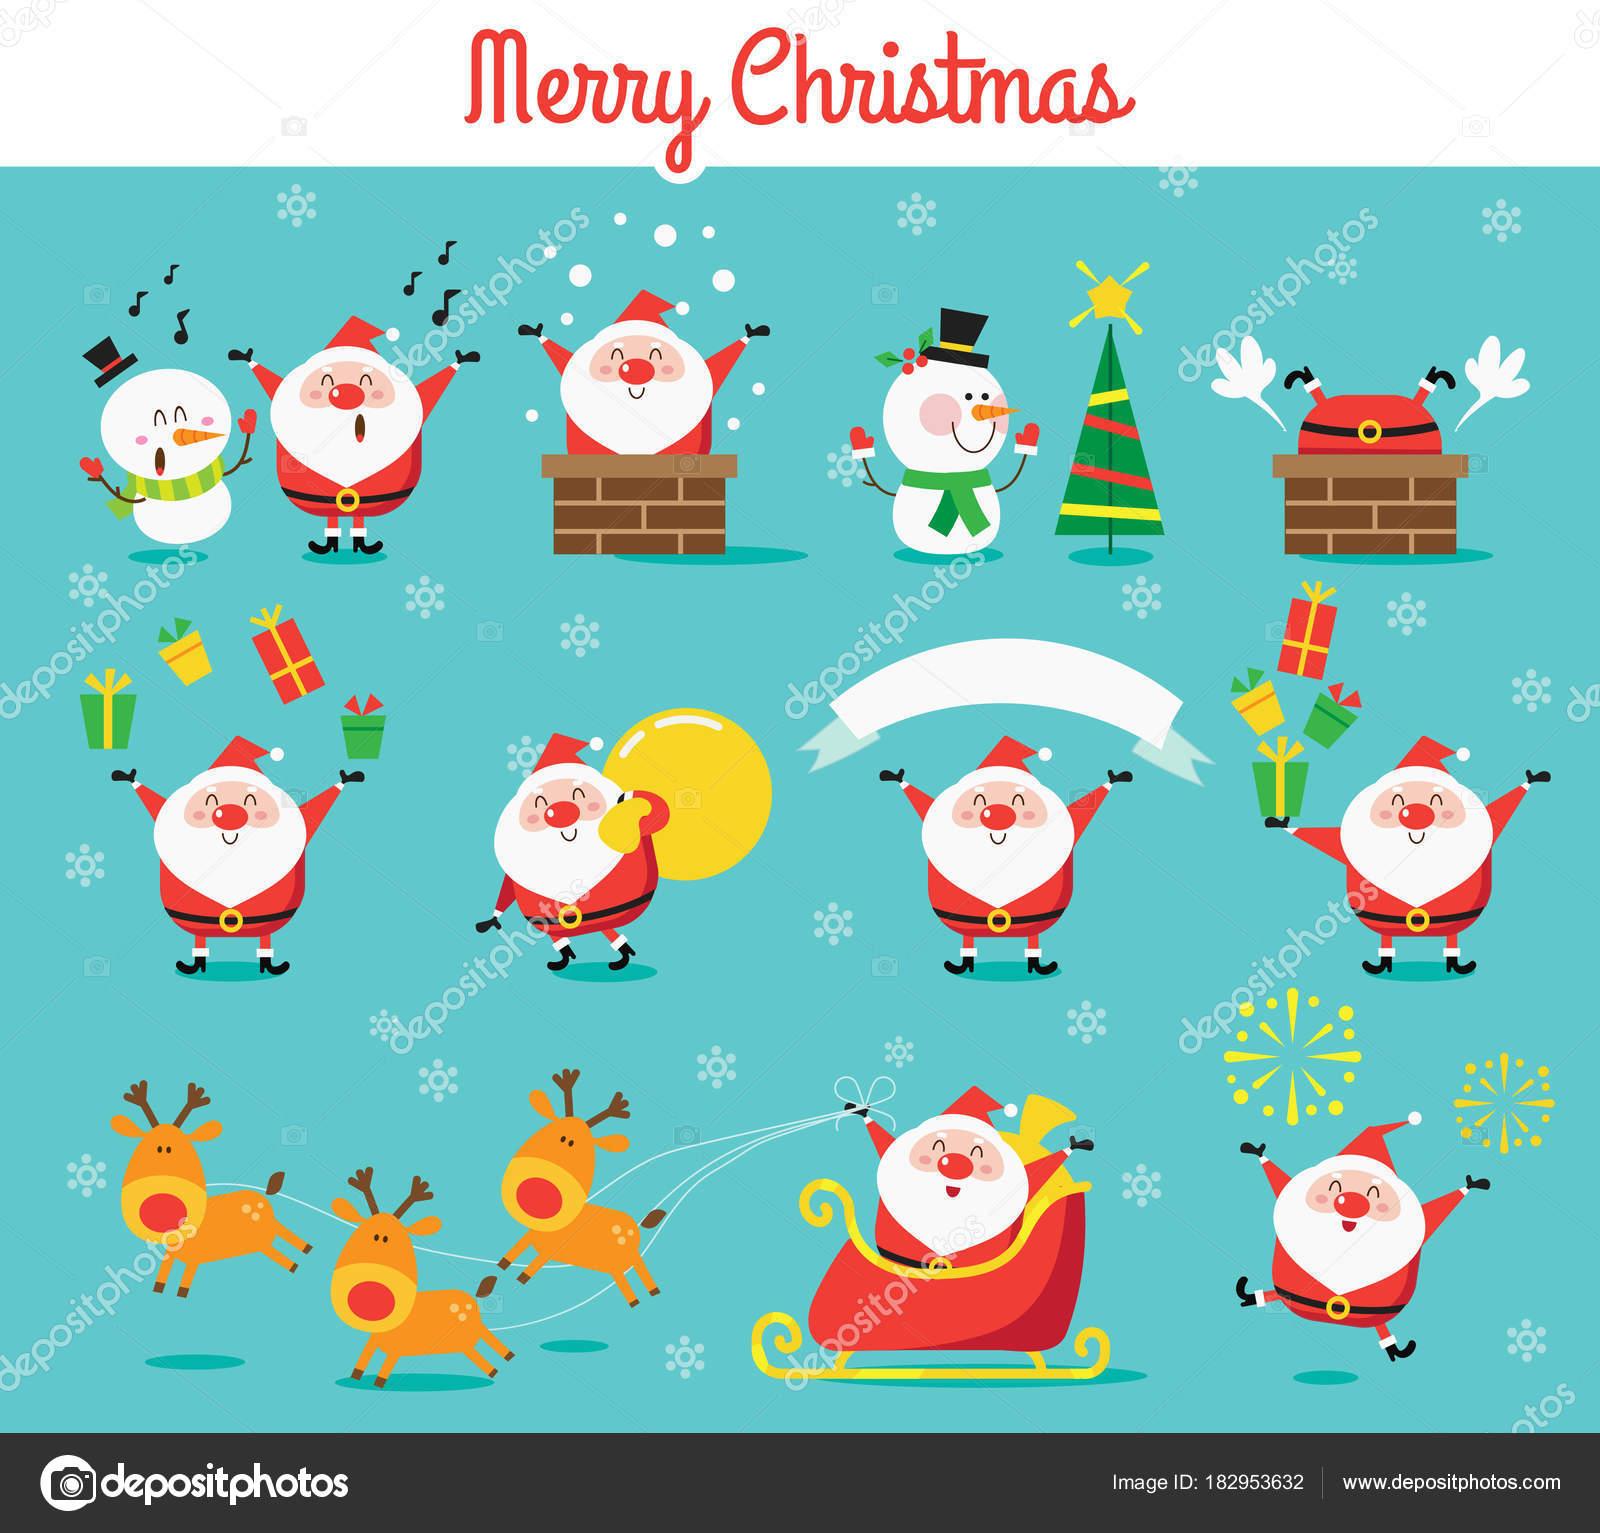 Christmas Celebration Cartoon Images.Santa Claus Cartoon Vector Set Merry Christmas Celebration